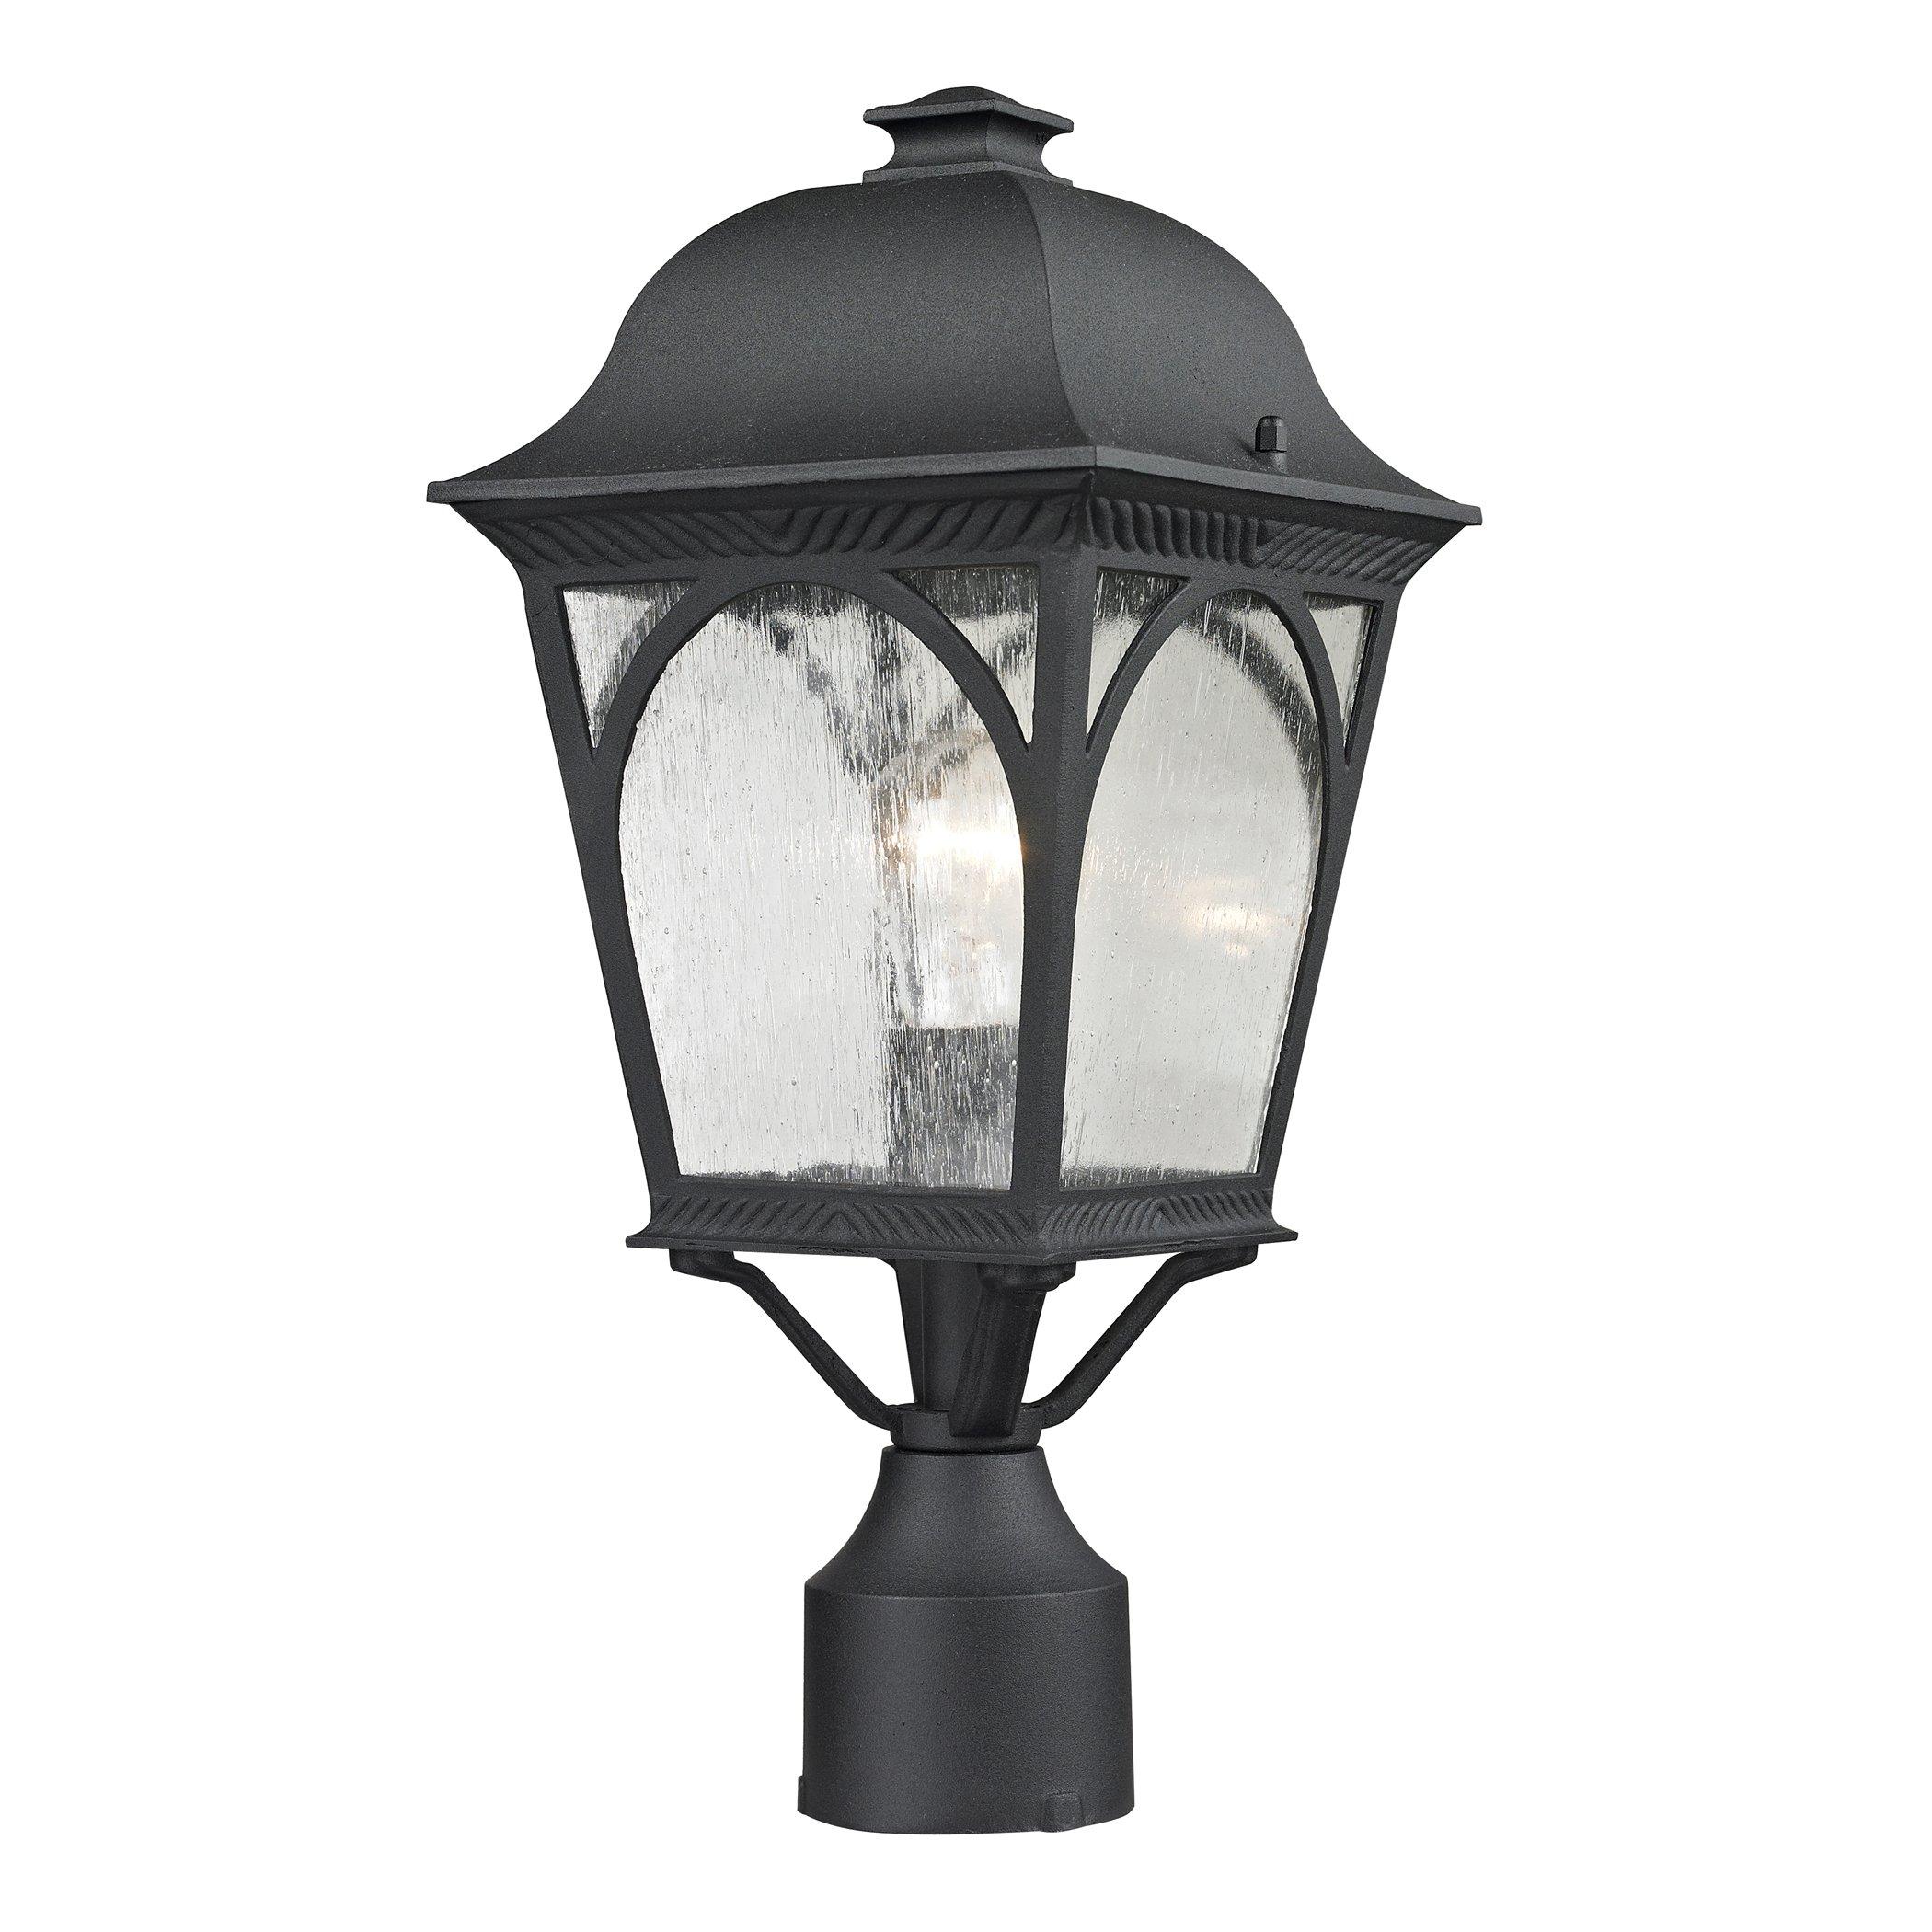 Cornerstone Lighting 8301EP/65 Cape Ann 1 Light Outdoor Pendant Lantern, Matte Textured Black